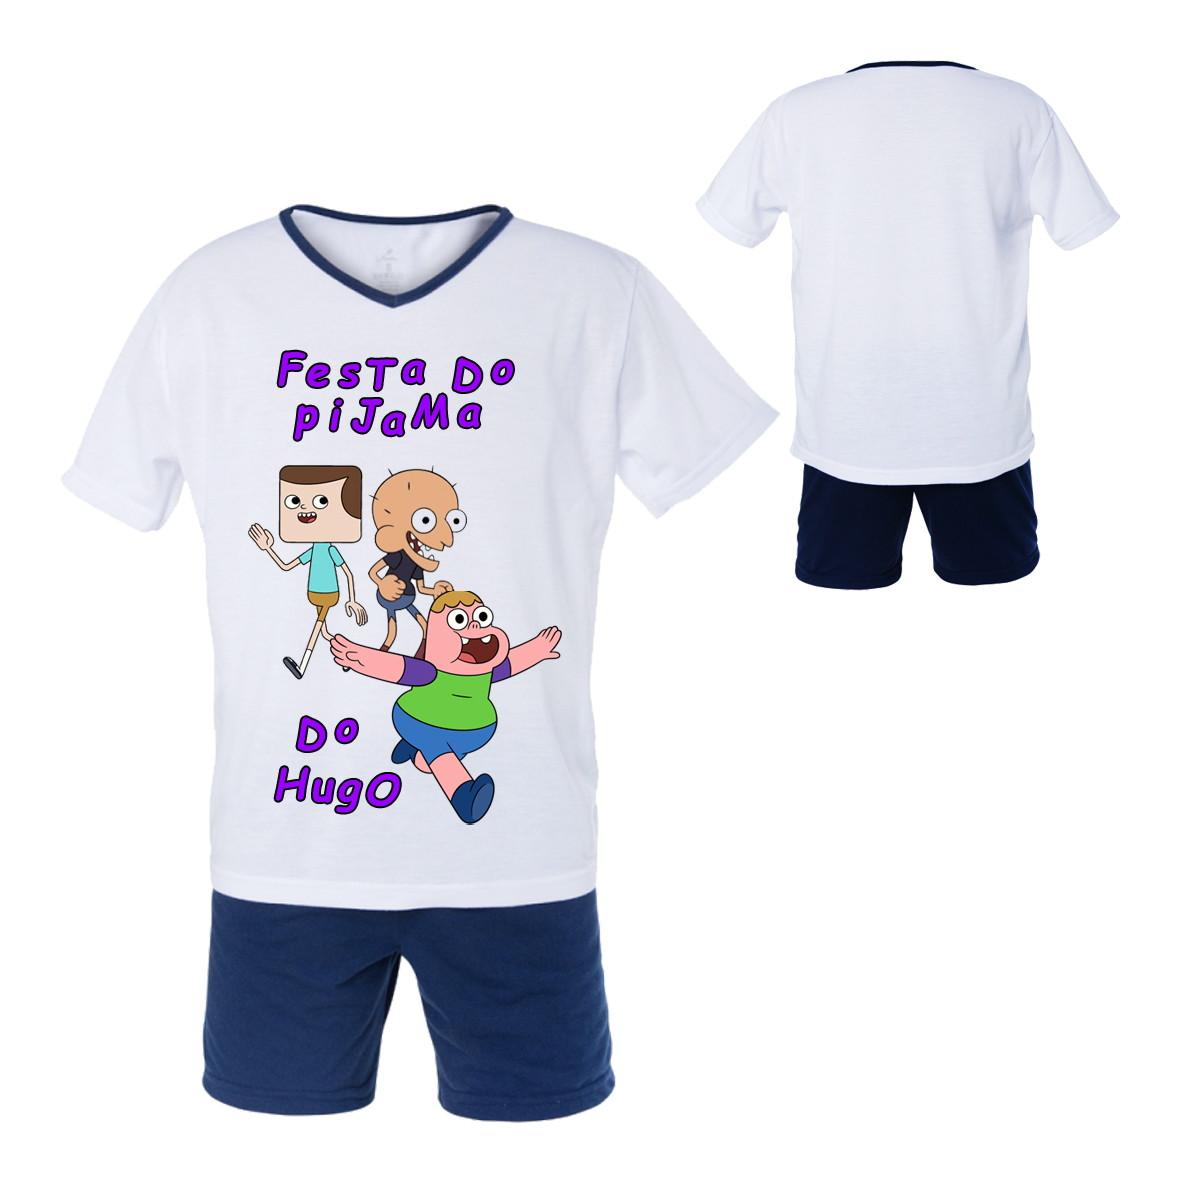 aa0c66fc1cd Conjunto Pijama Infantil Masculino no Elo7